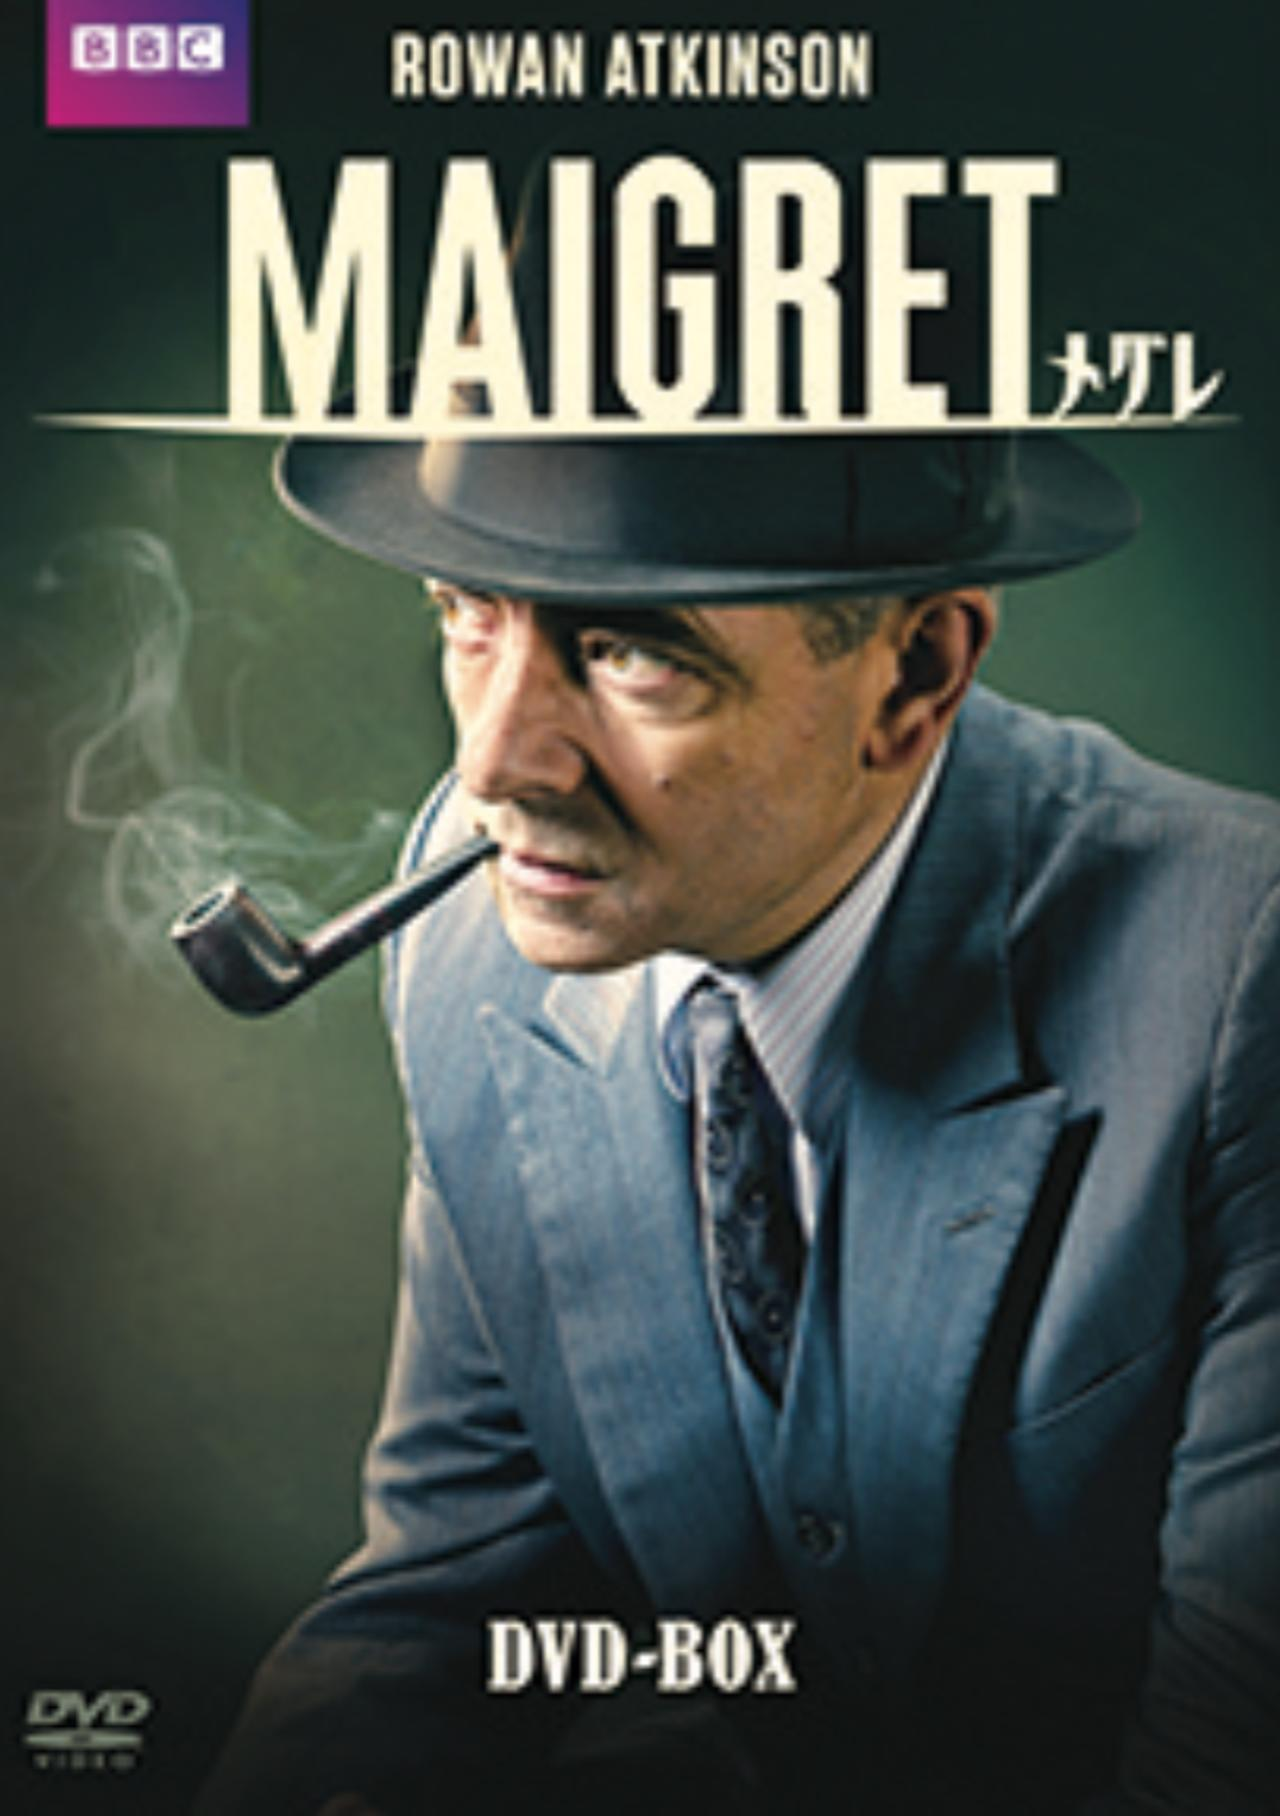 画像: 「MAIGRET /メグレ」DVD-BOX KADOKAWA /11月10日発売、6500円+税(2枚組)